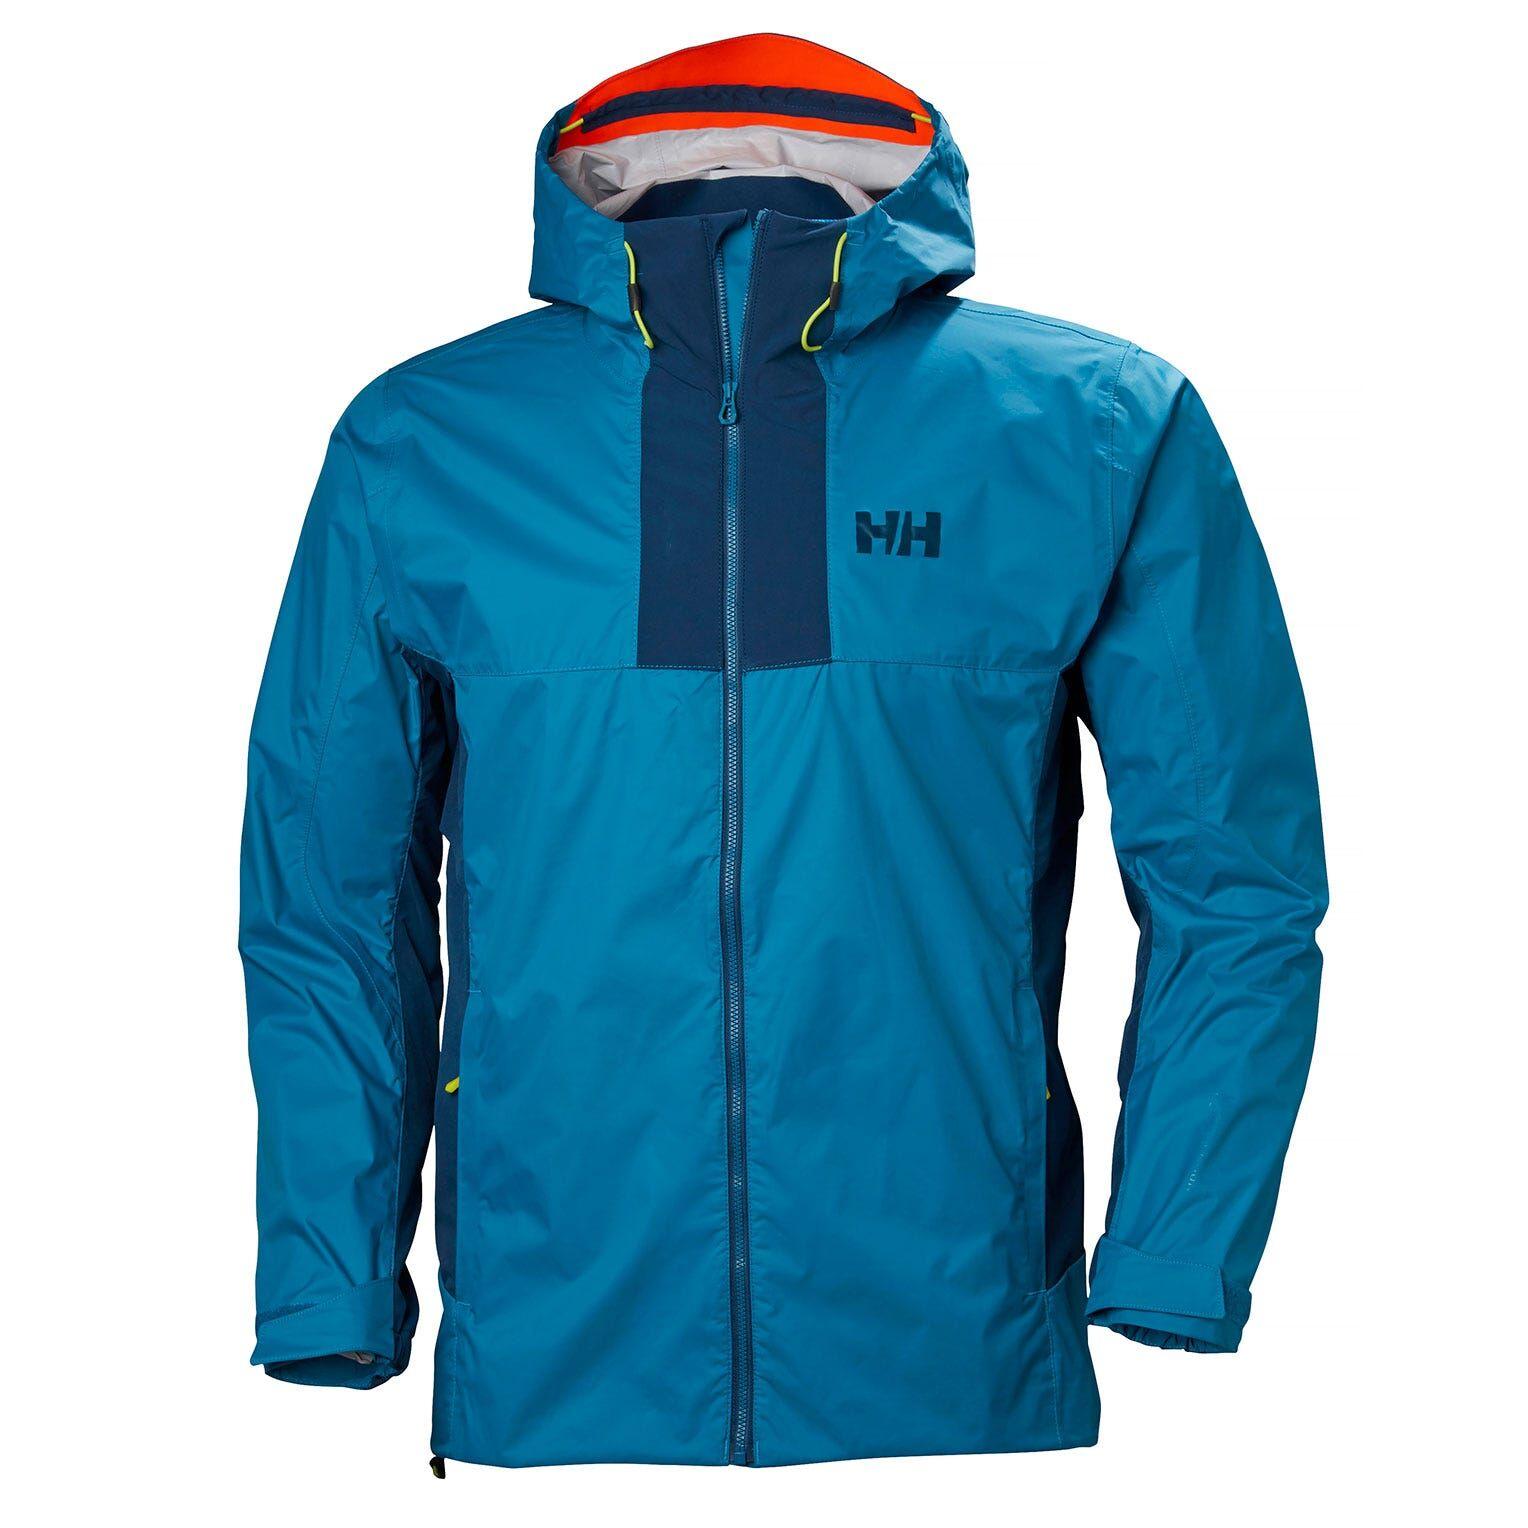 Helly Hansen Vanir Logr Jacket Mens Hiking Blue M